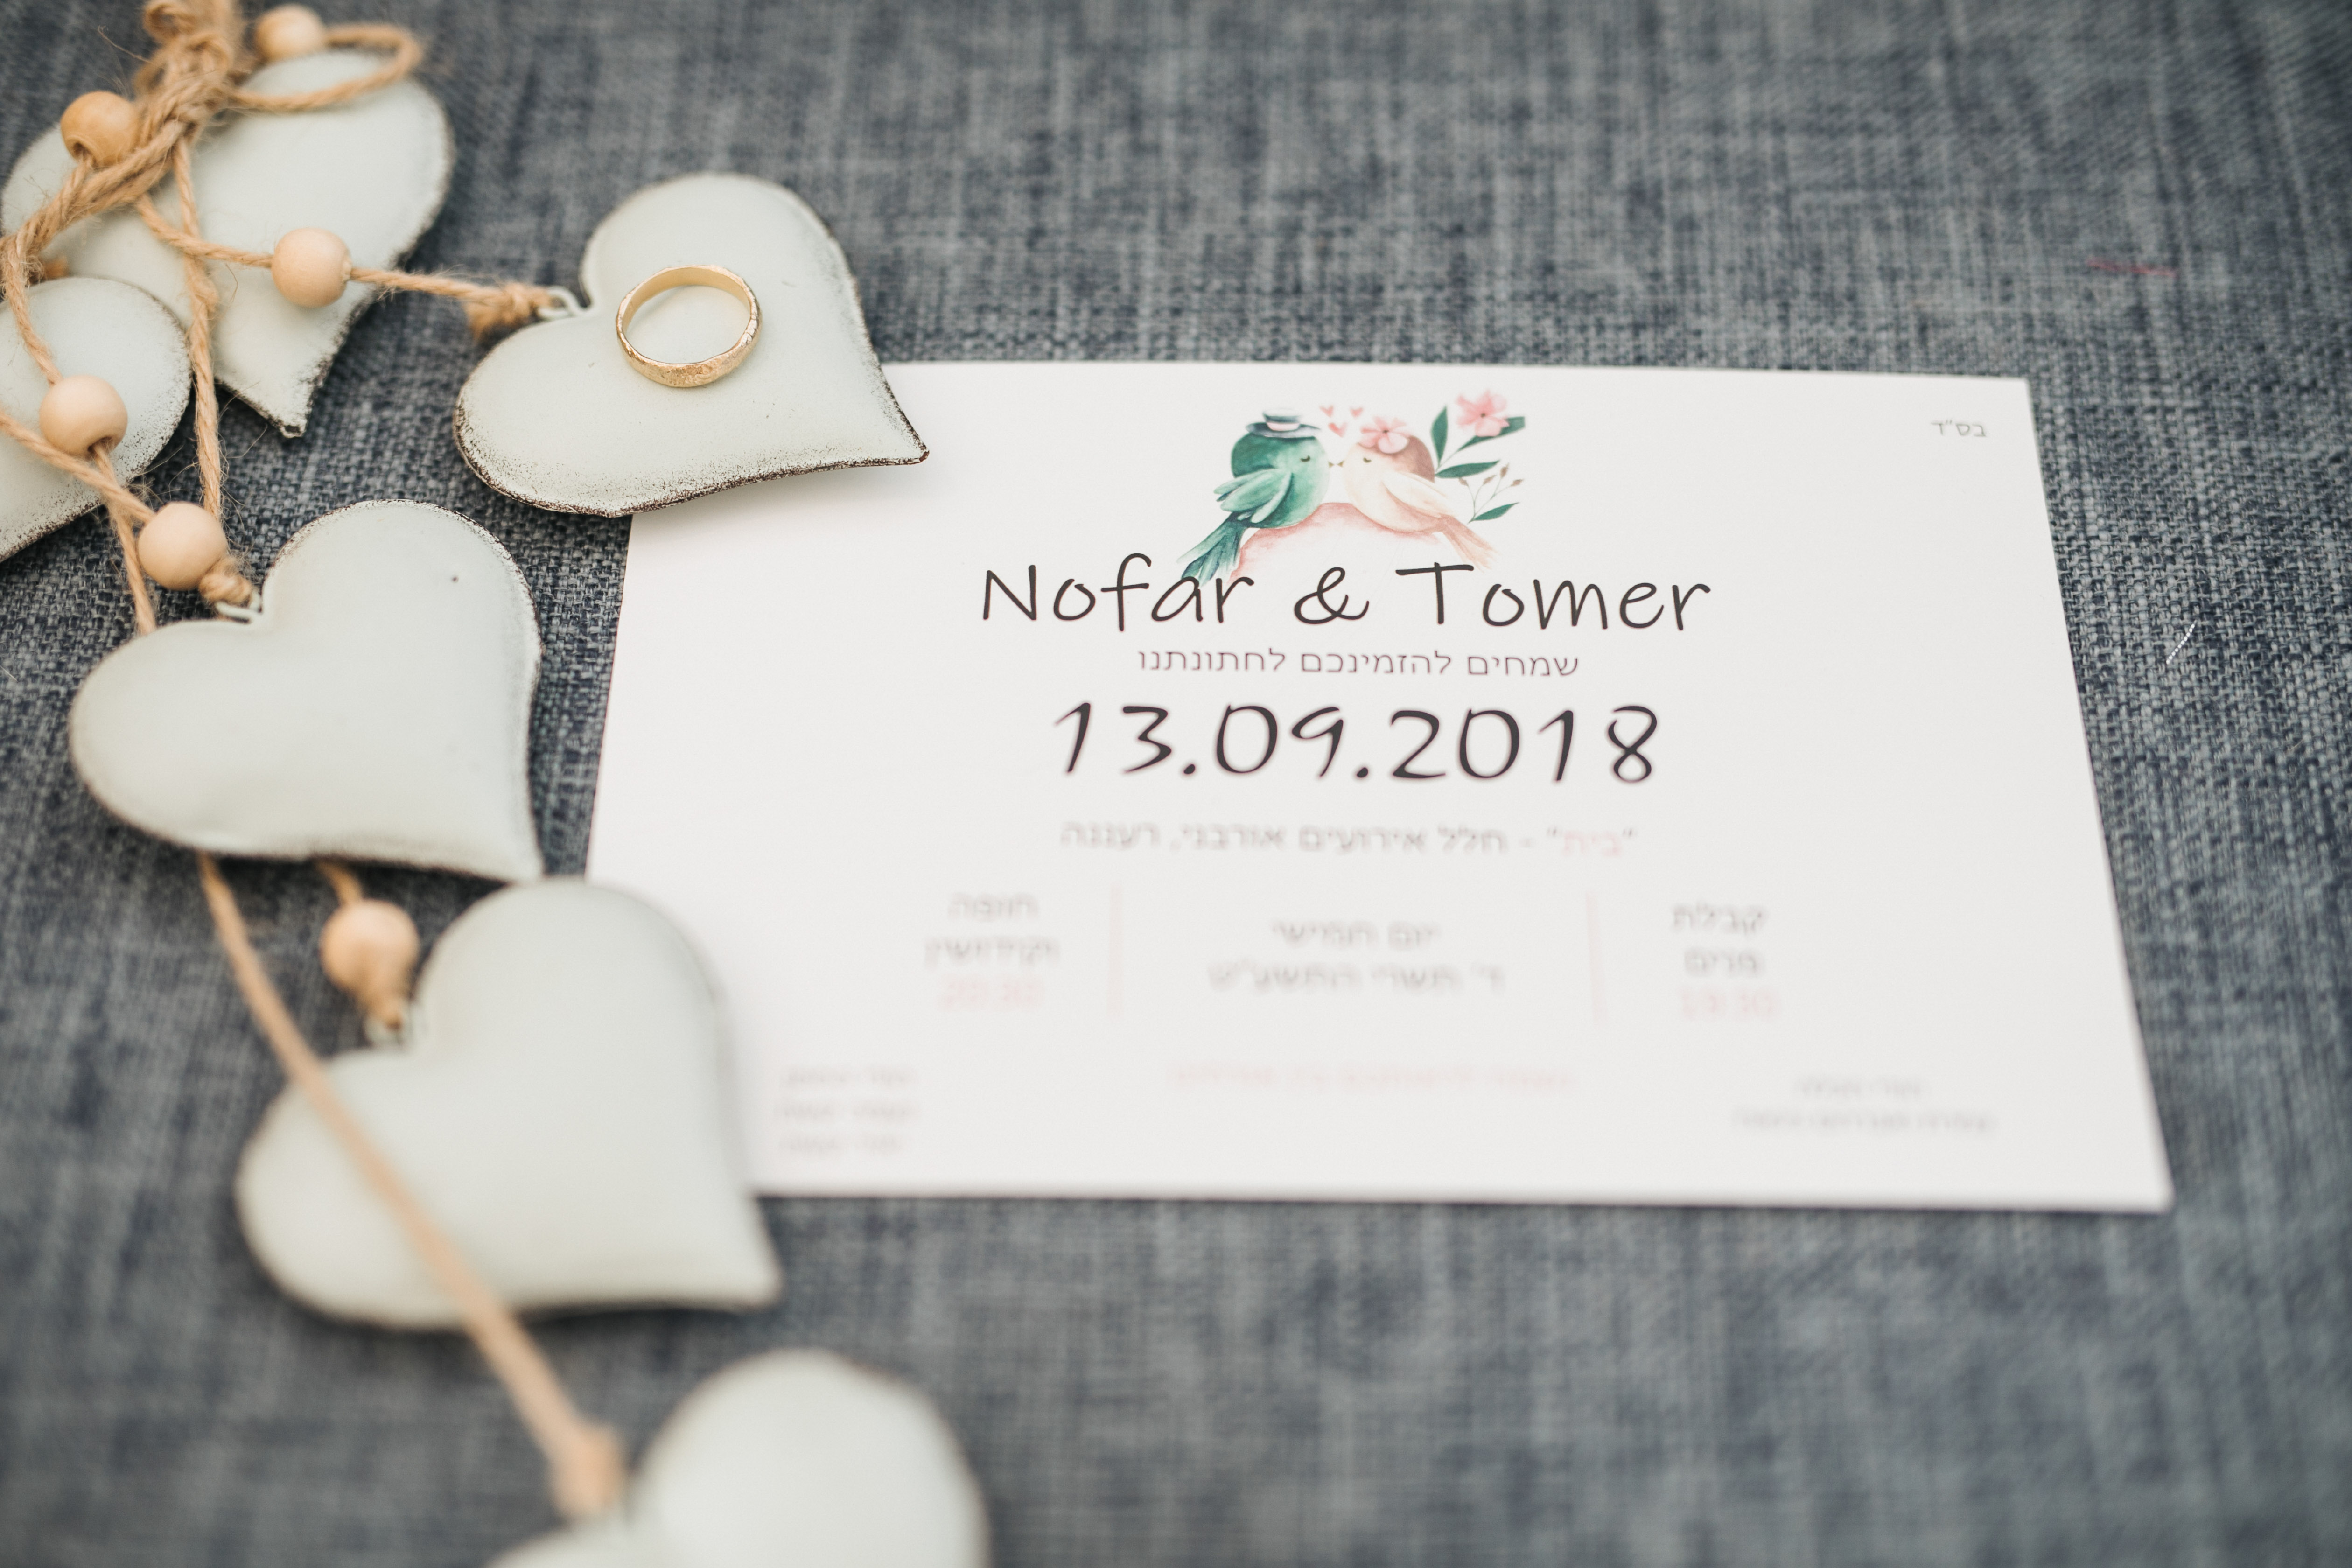 Nofar & Tomer-34